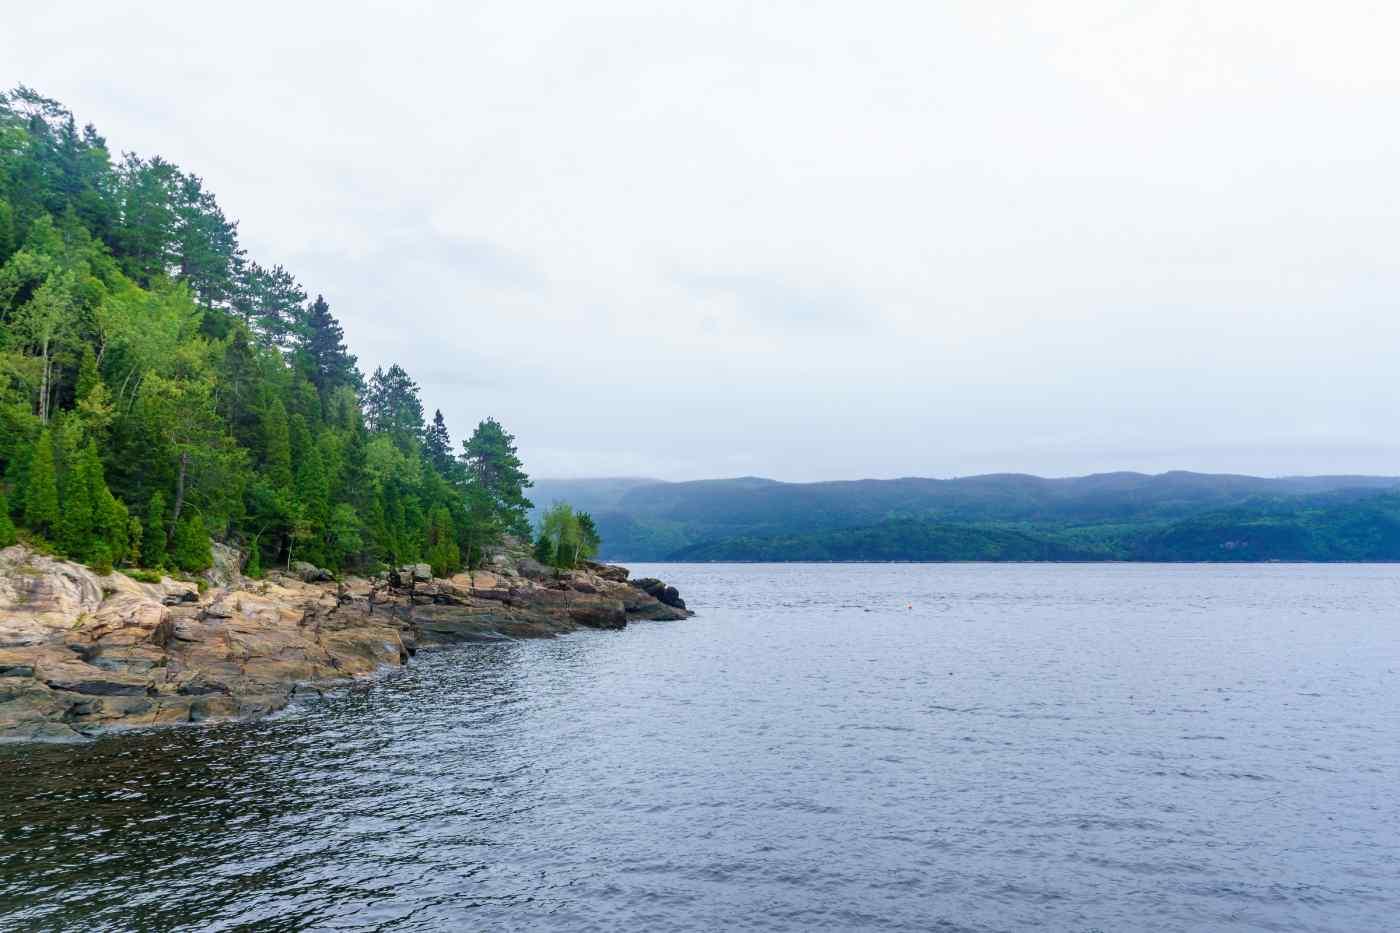 Saguenay Fjord near Quebec, Canada